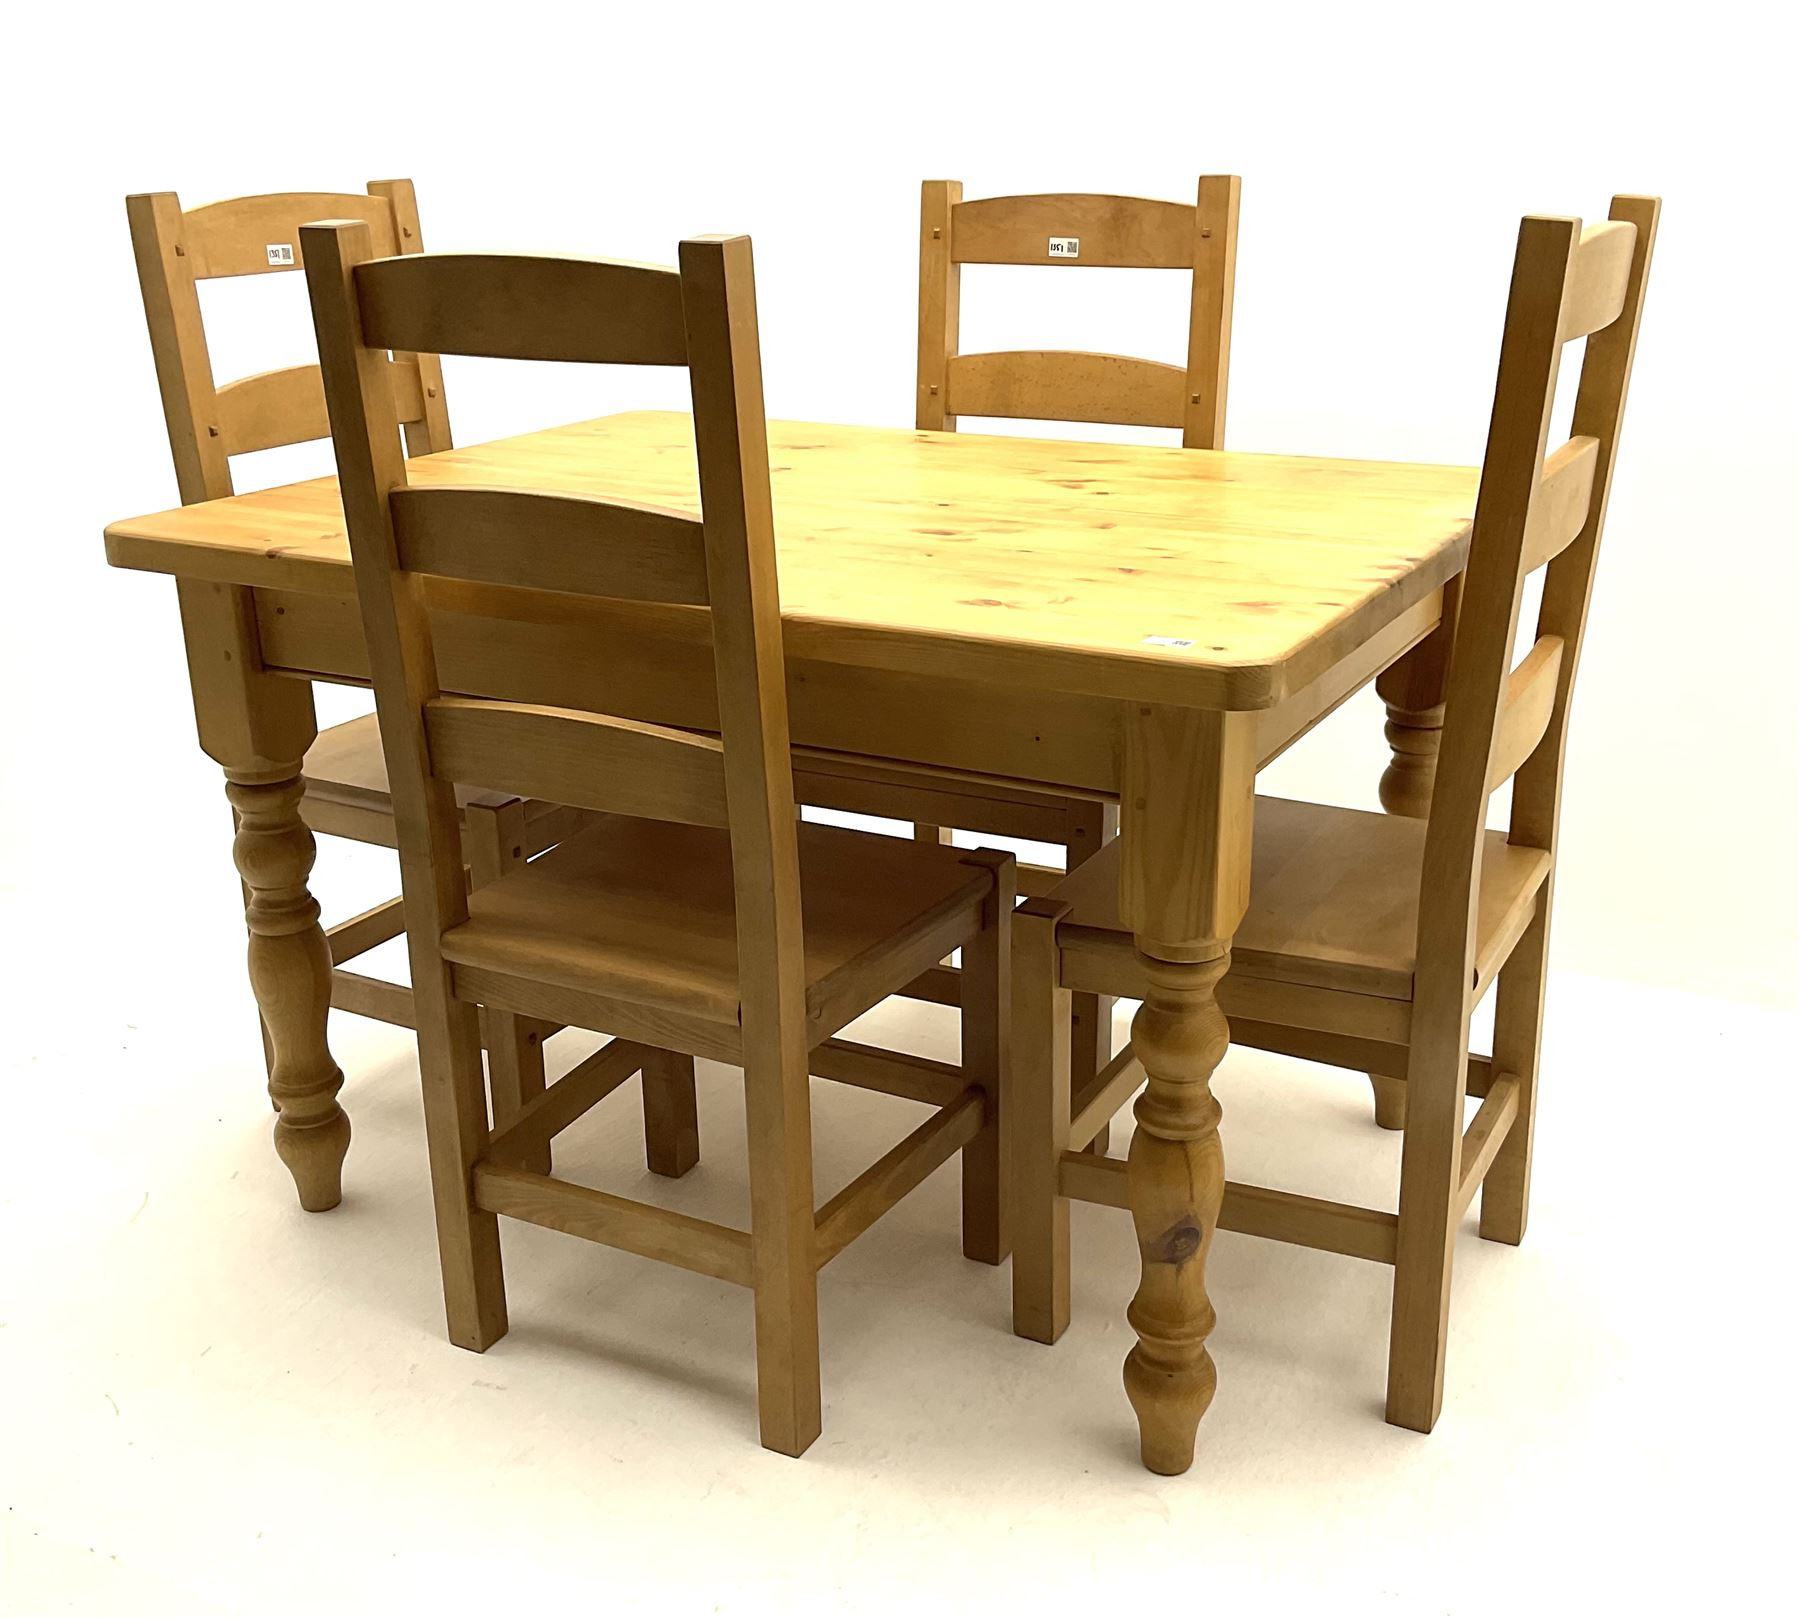 Rectangular pine farmhouse table